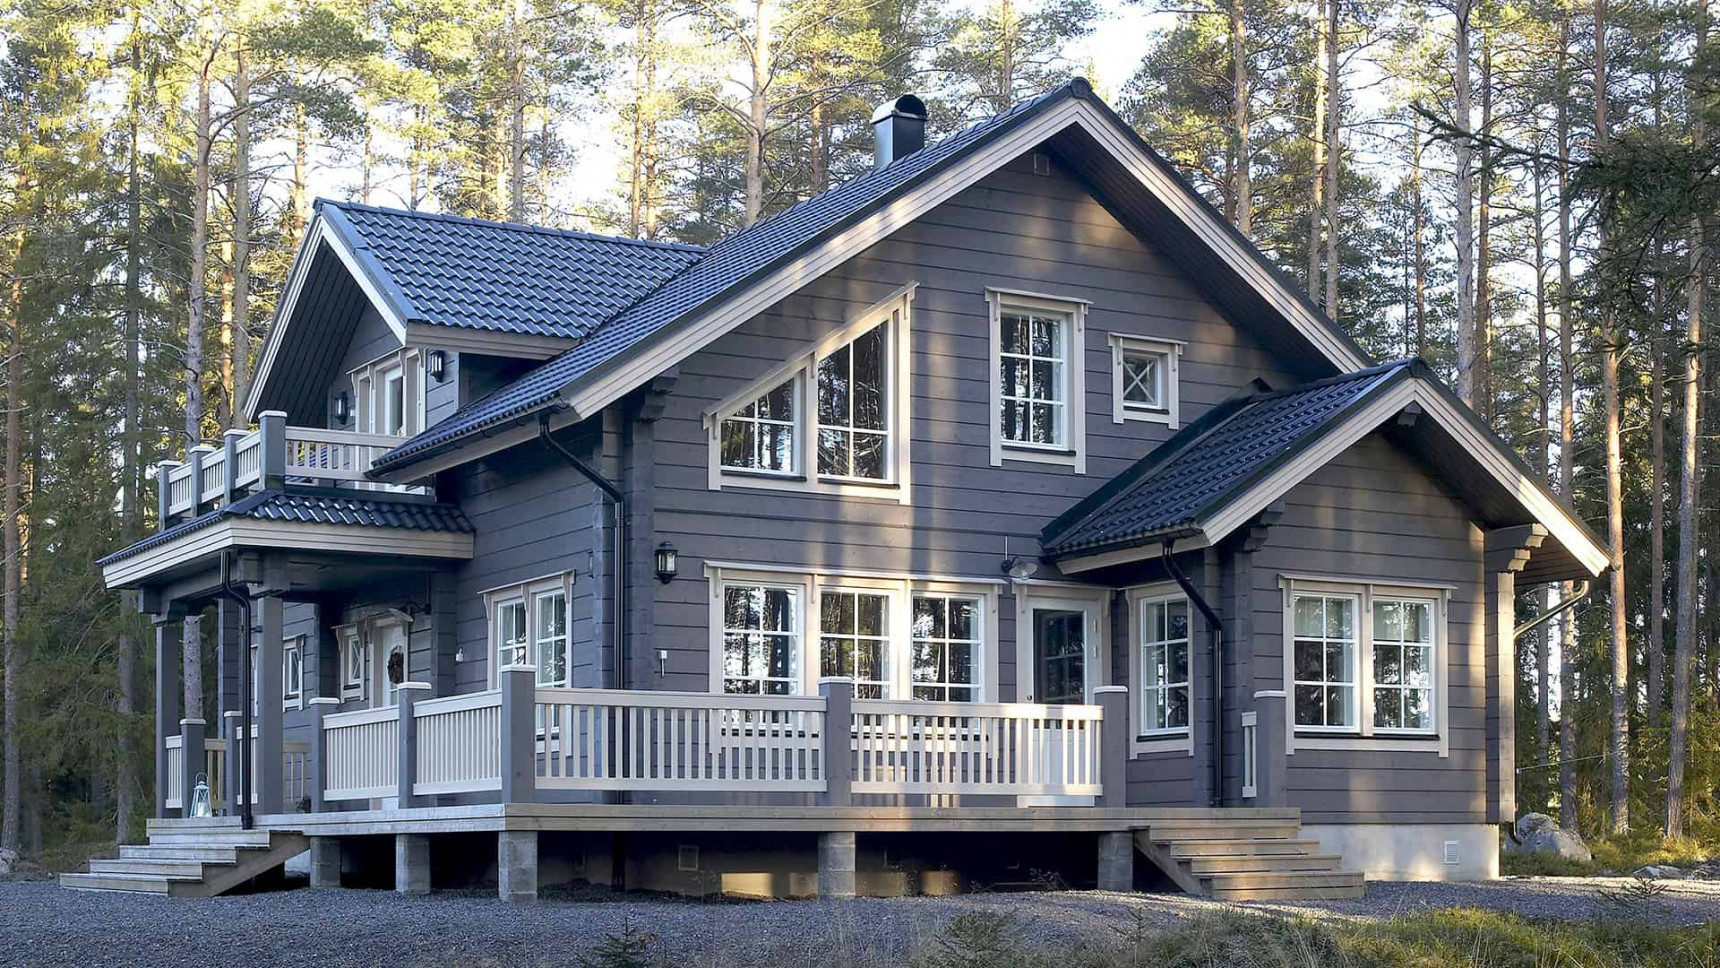 Kuusamo-Hirsitalor-Riekamo_176_1.